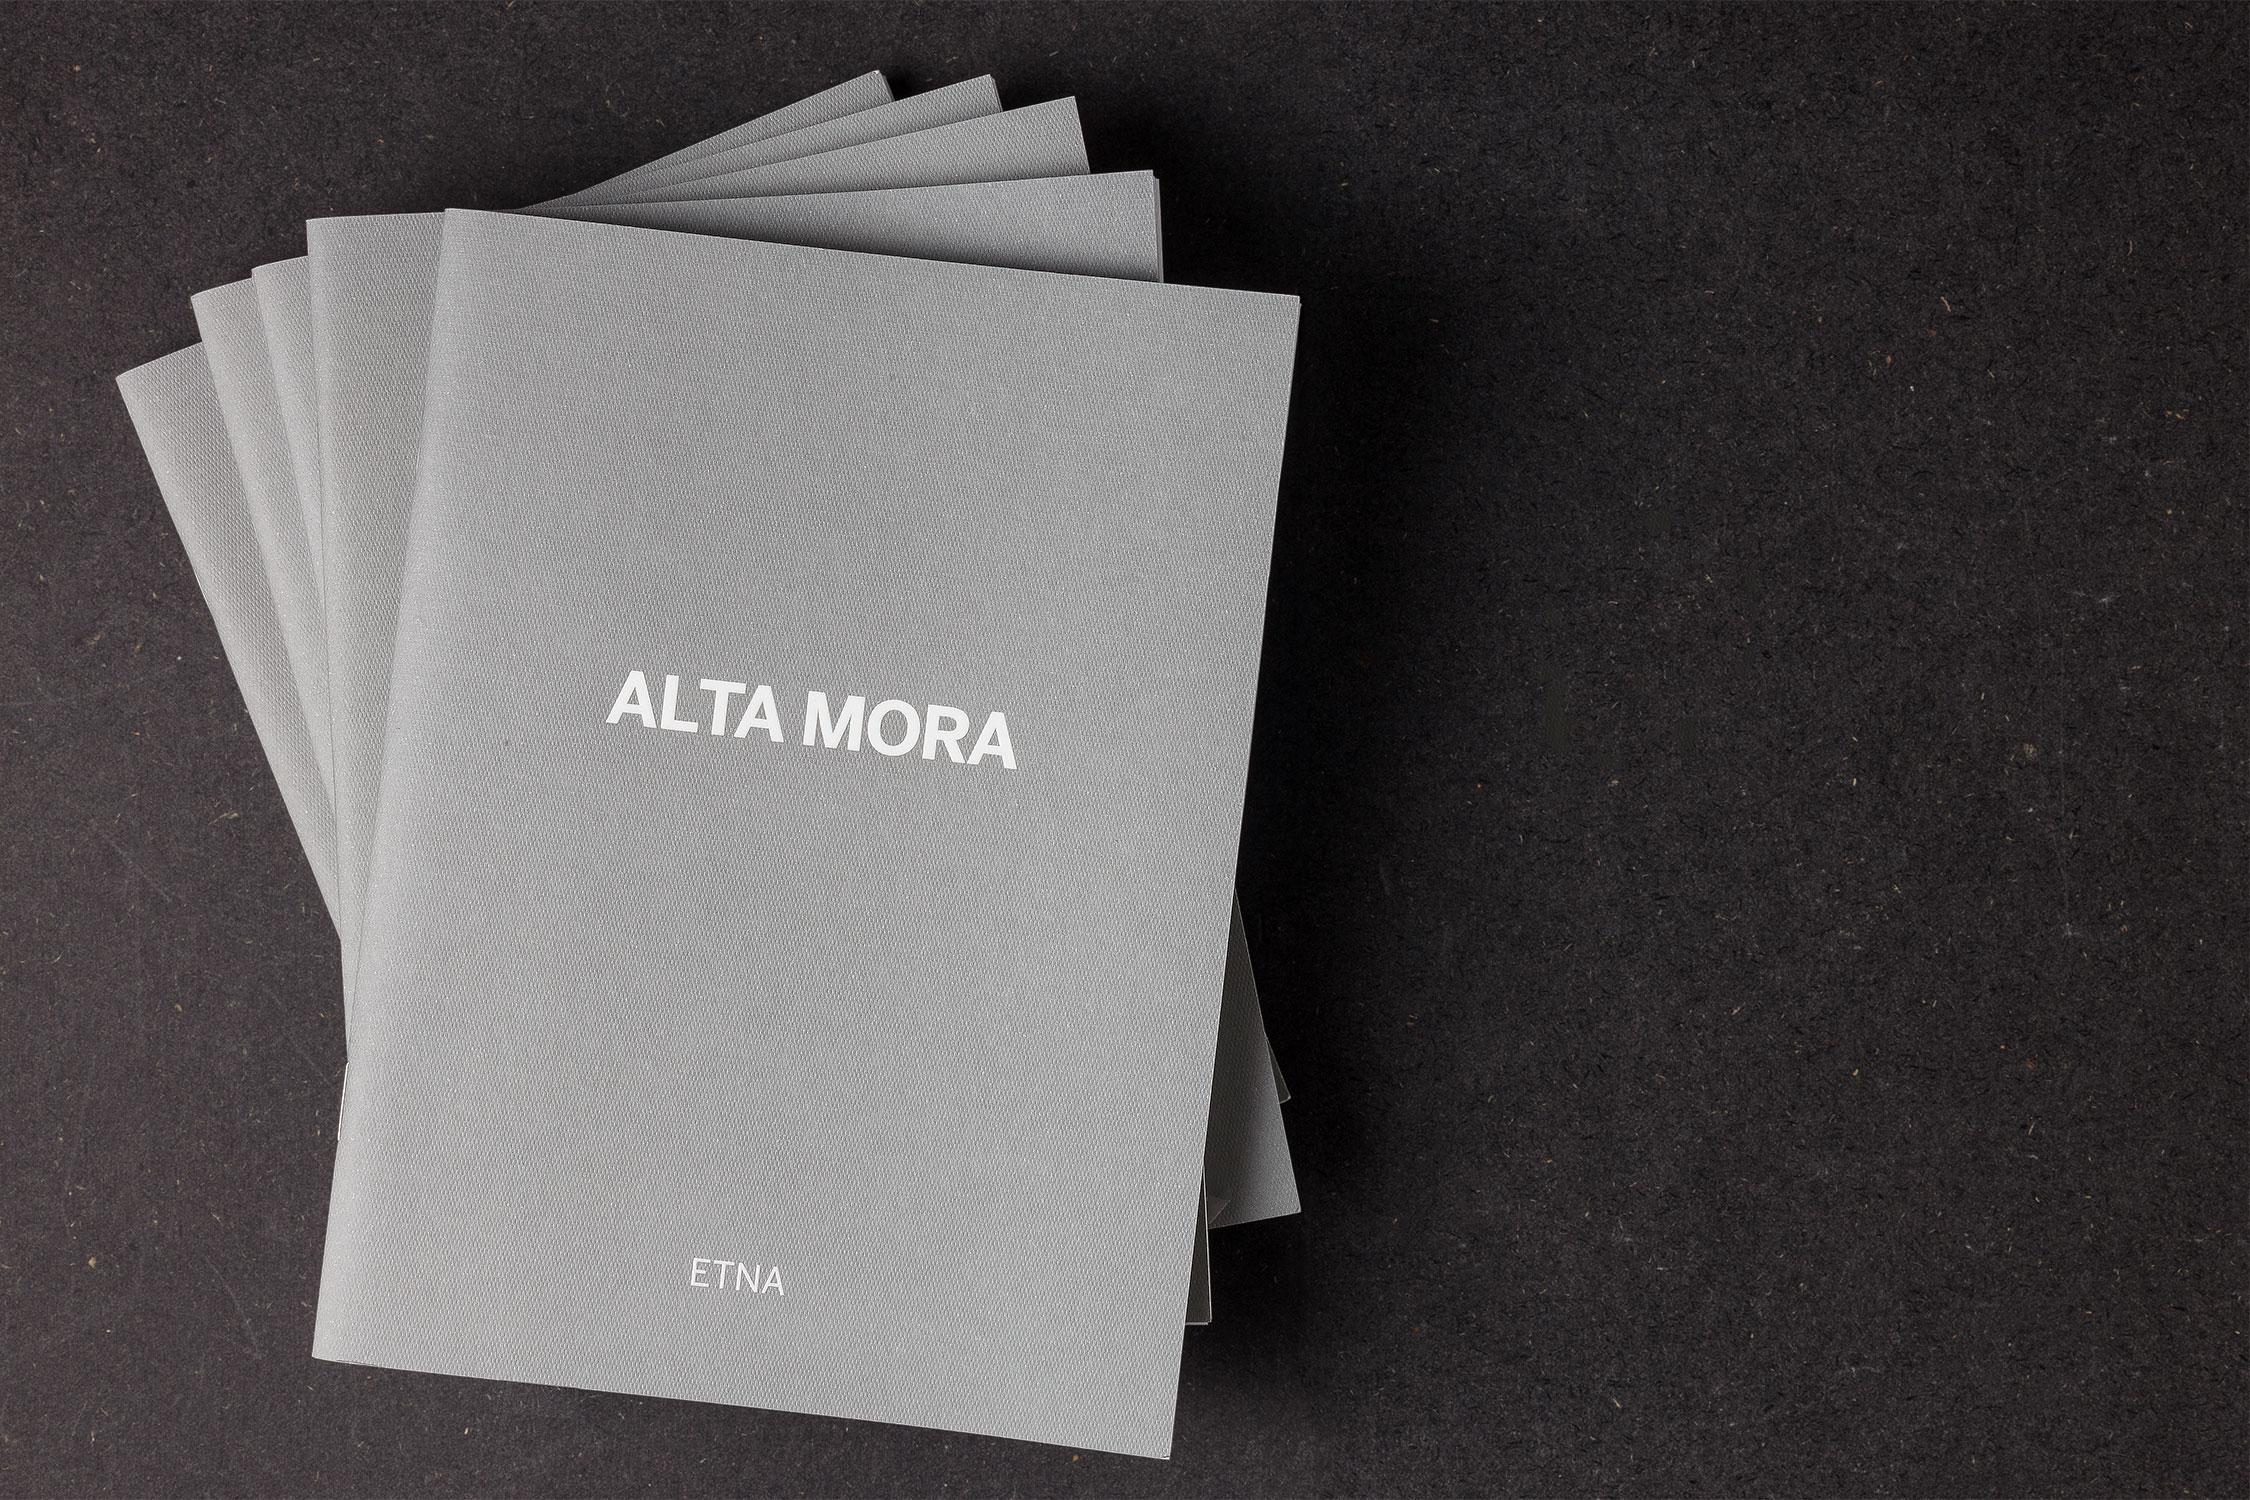 altamora_atelier790_6905